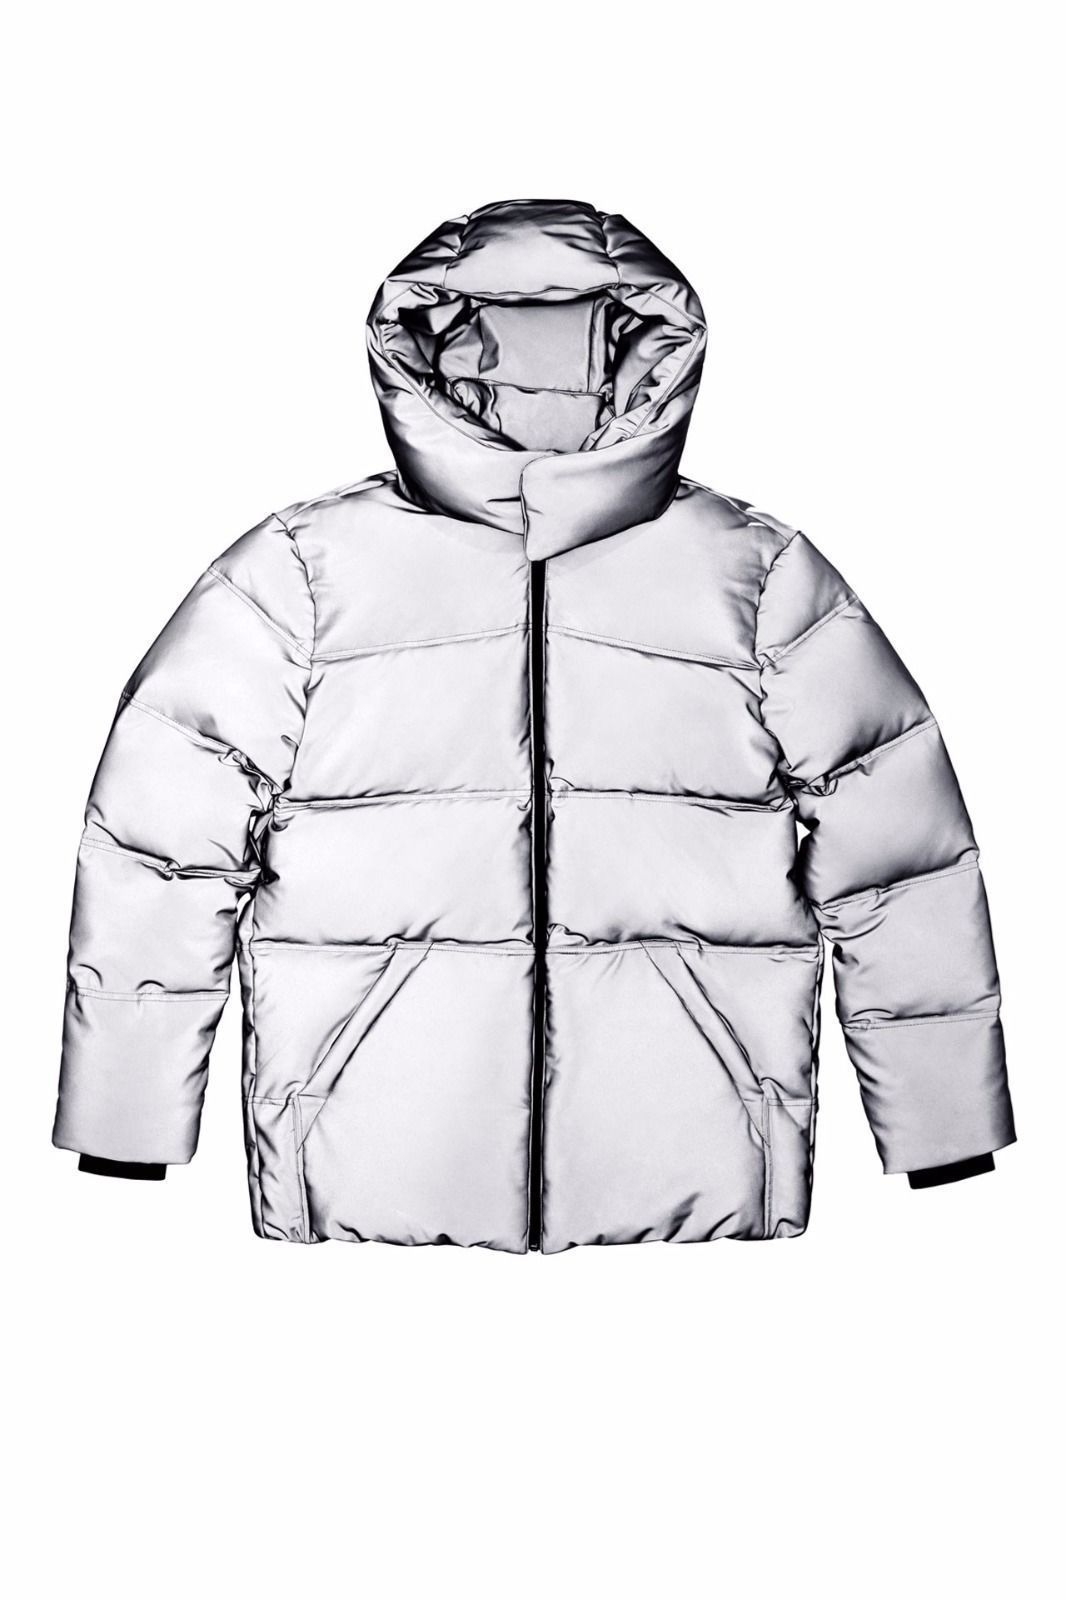 Alexander Wang x H&M Mens Reflective Down Jacket Size S